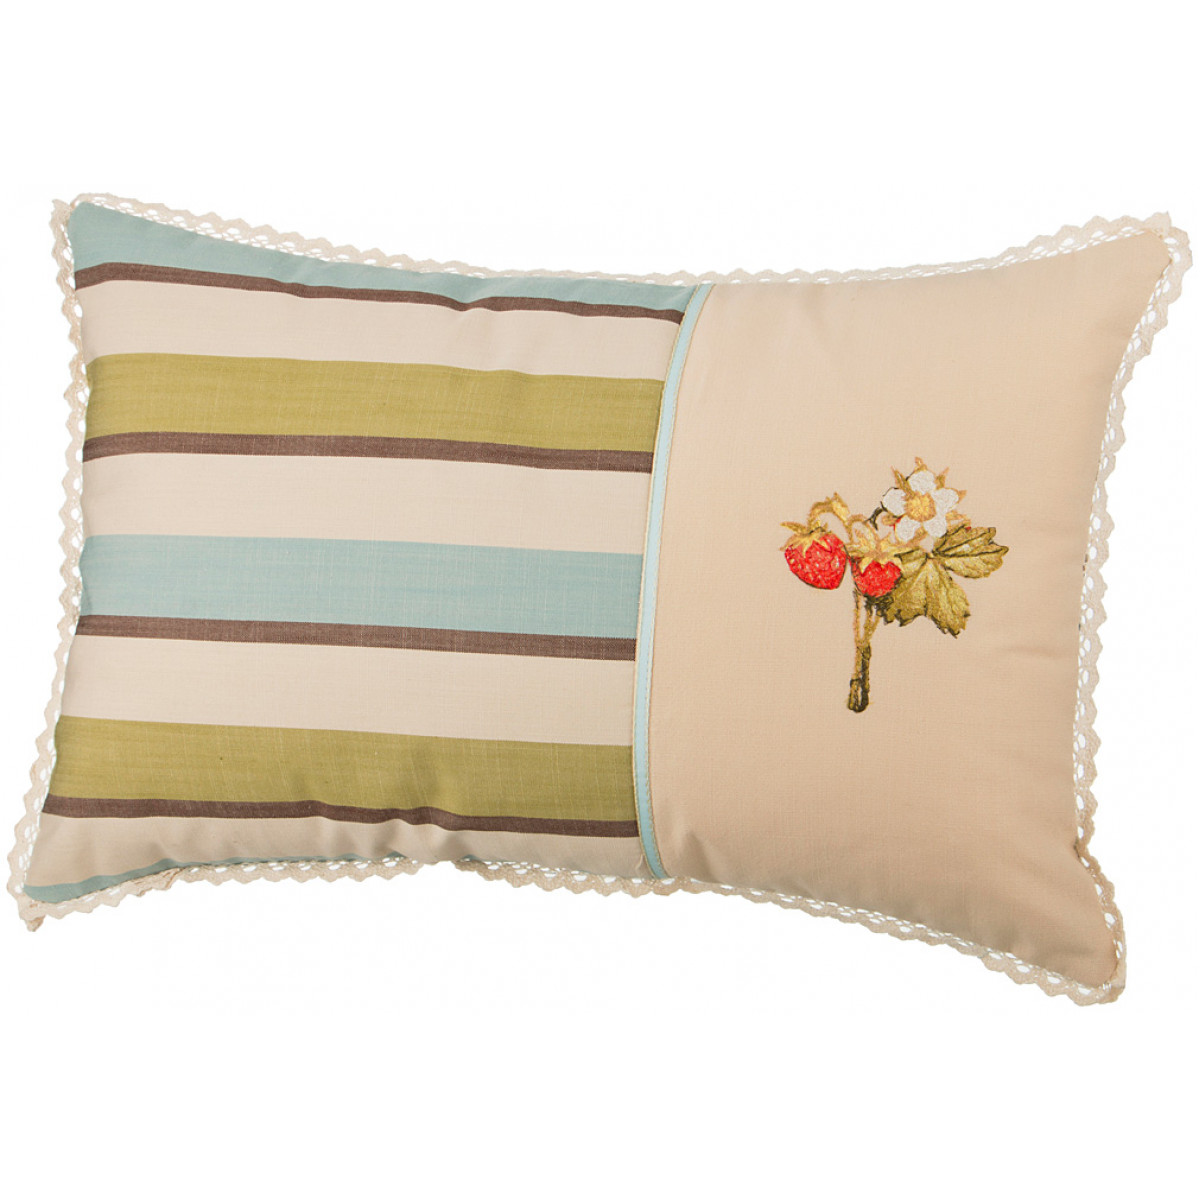 Декоративные подушки Santalino Декоративная подушка Фрутта (37х57) подушка декоративная santalino райский сад 850 818 6